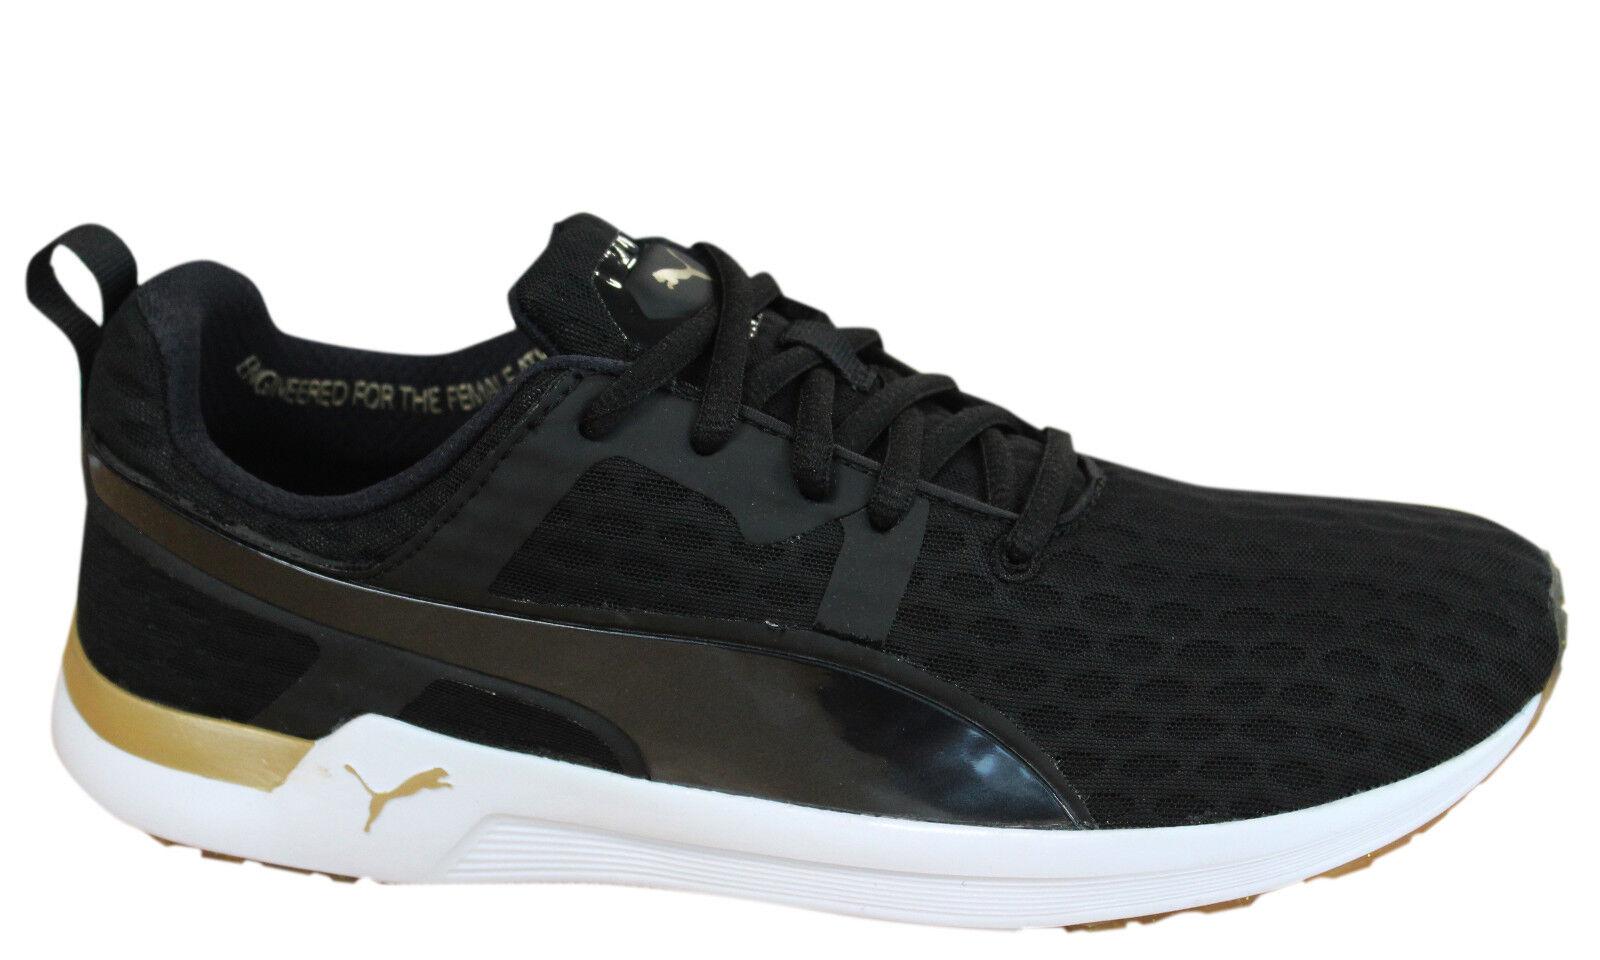 b1f2fc6b44b6 Puma Pulse XT v2 Black Gold Womens Lace Up Textile Trainers 188971 ...